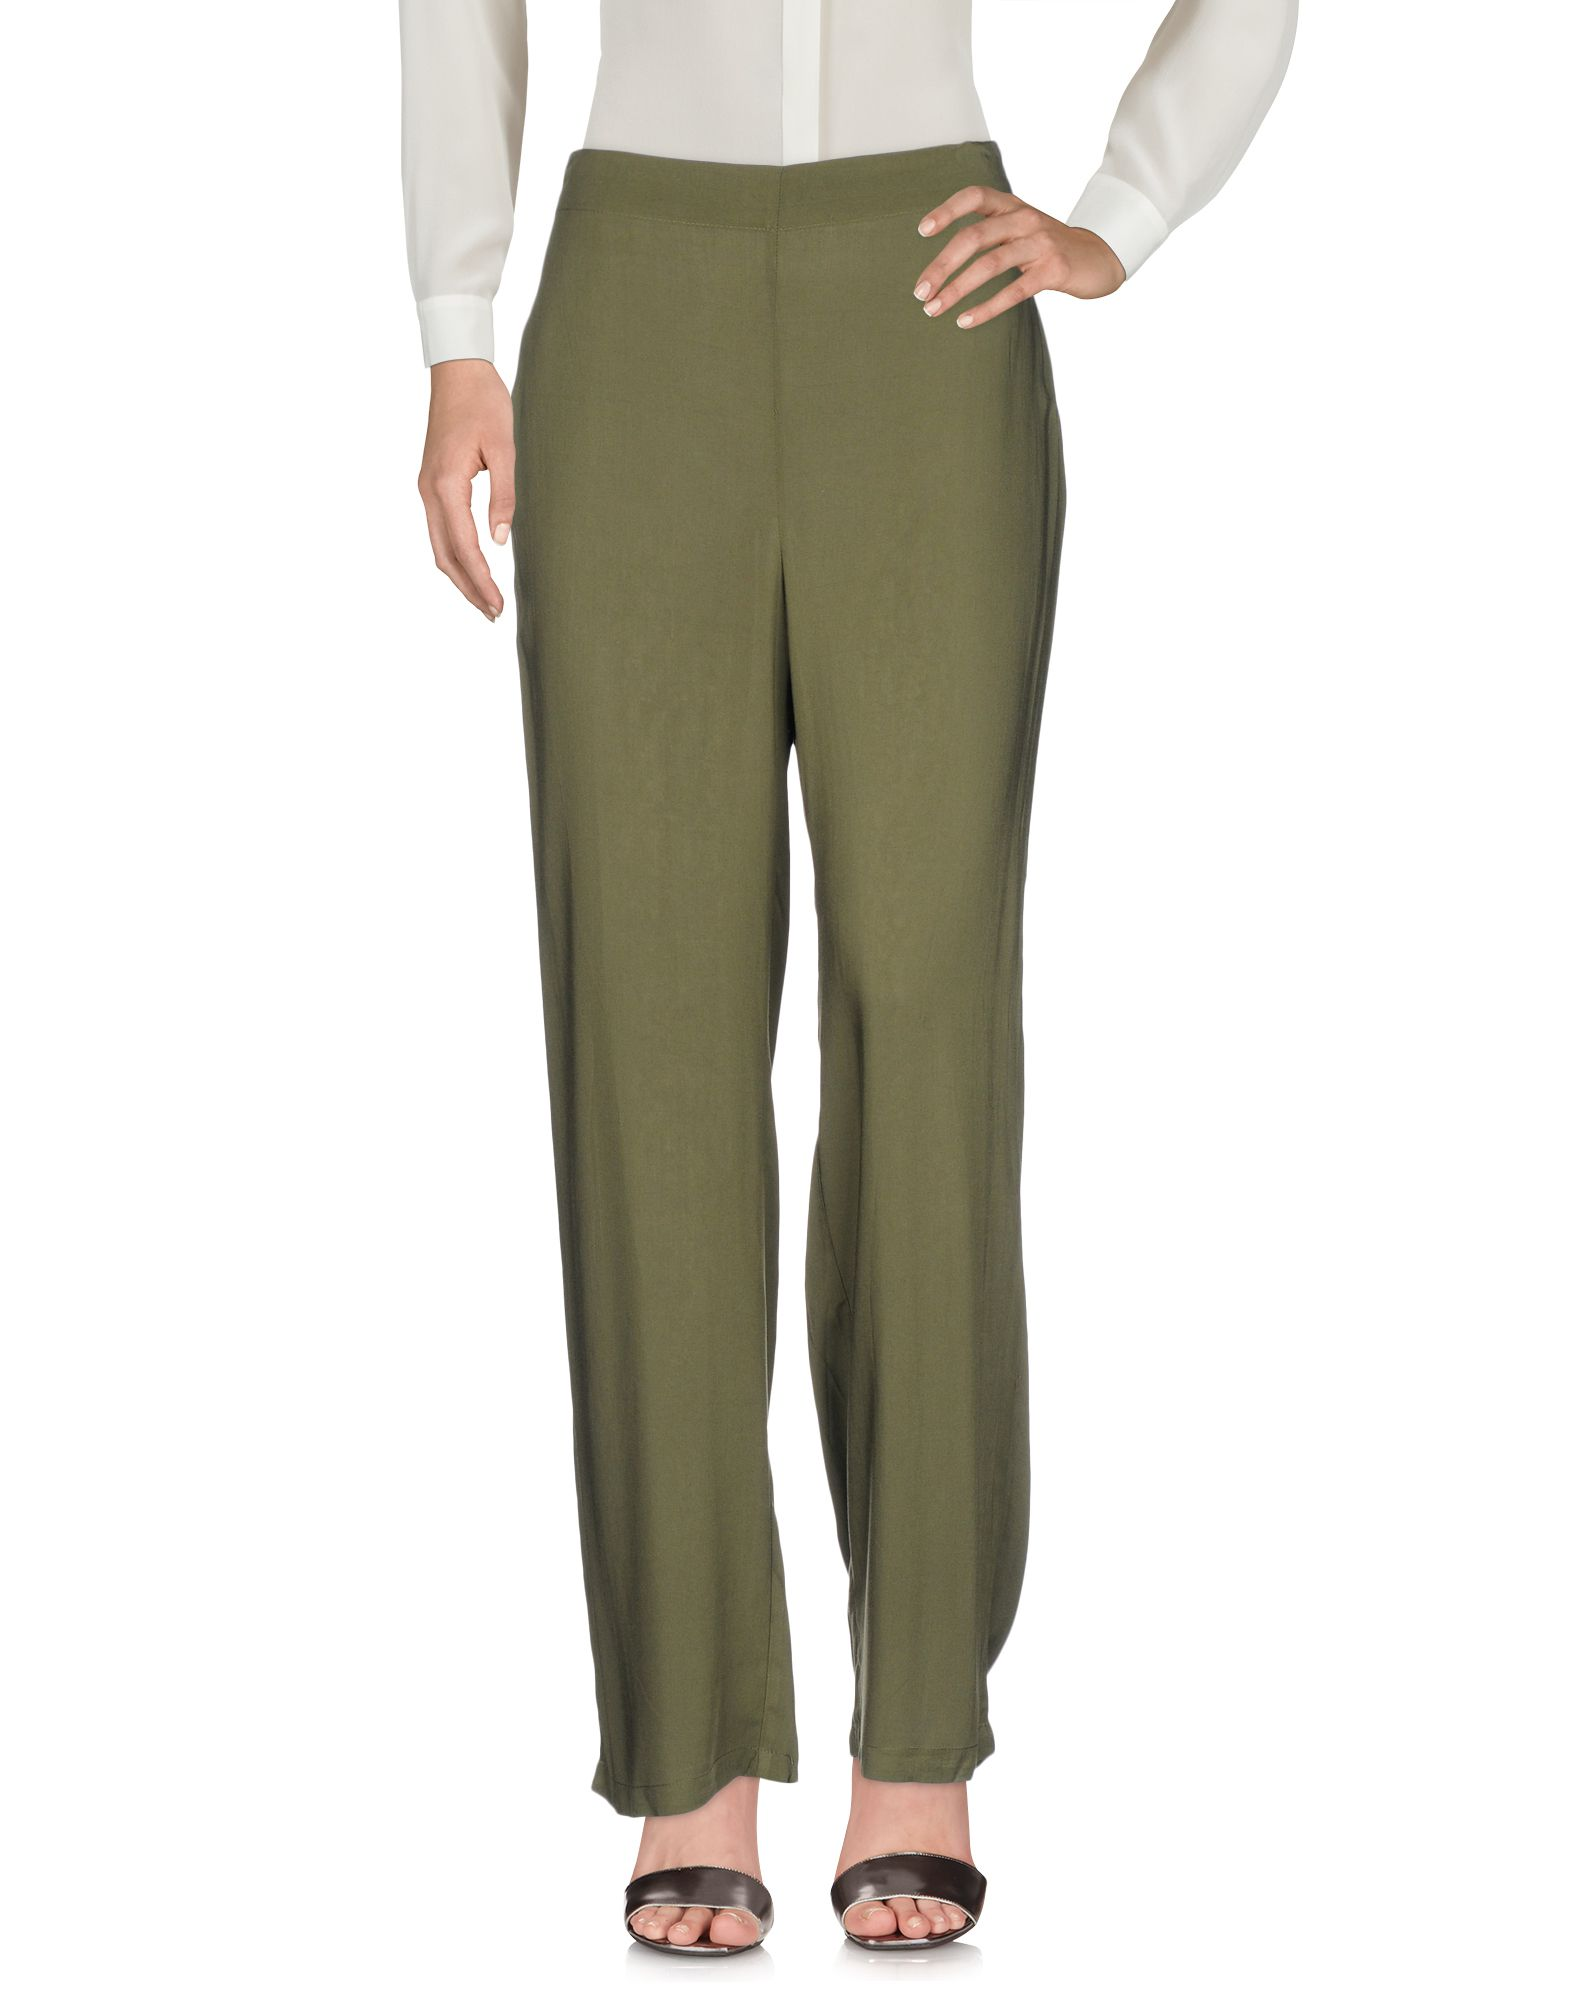 VERO MODA Повседневные брюки три четверти брюки moda di chiara брюки широкие